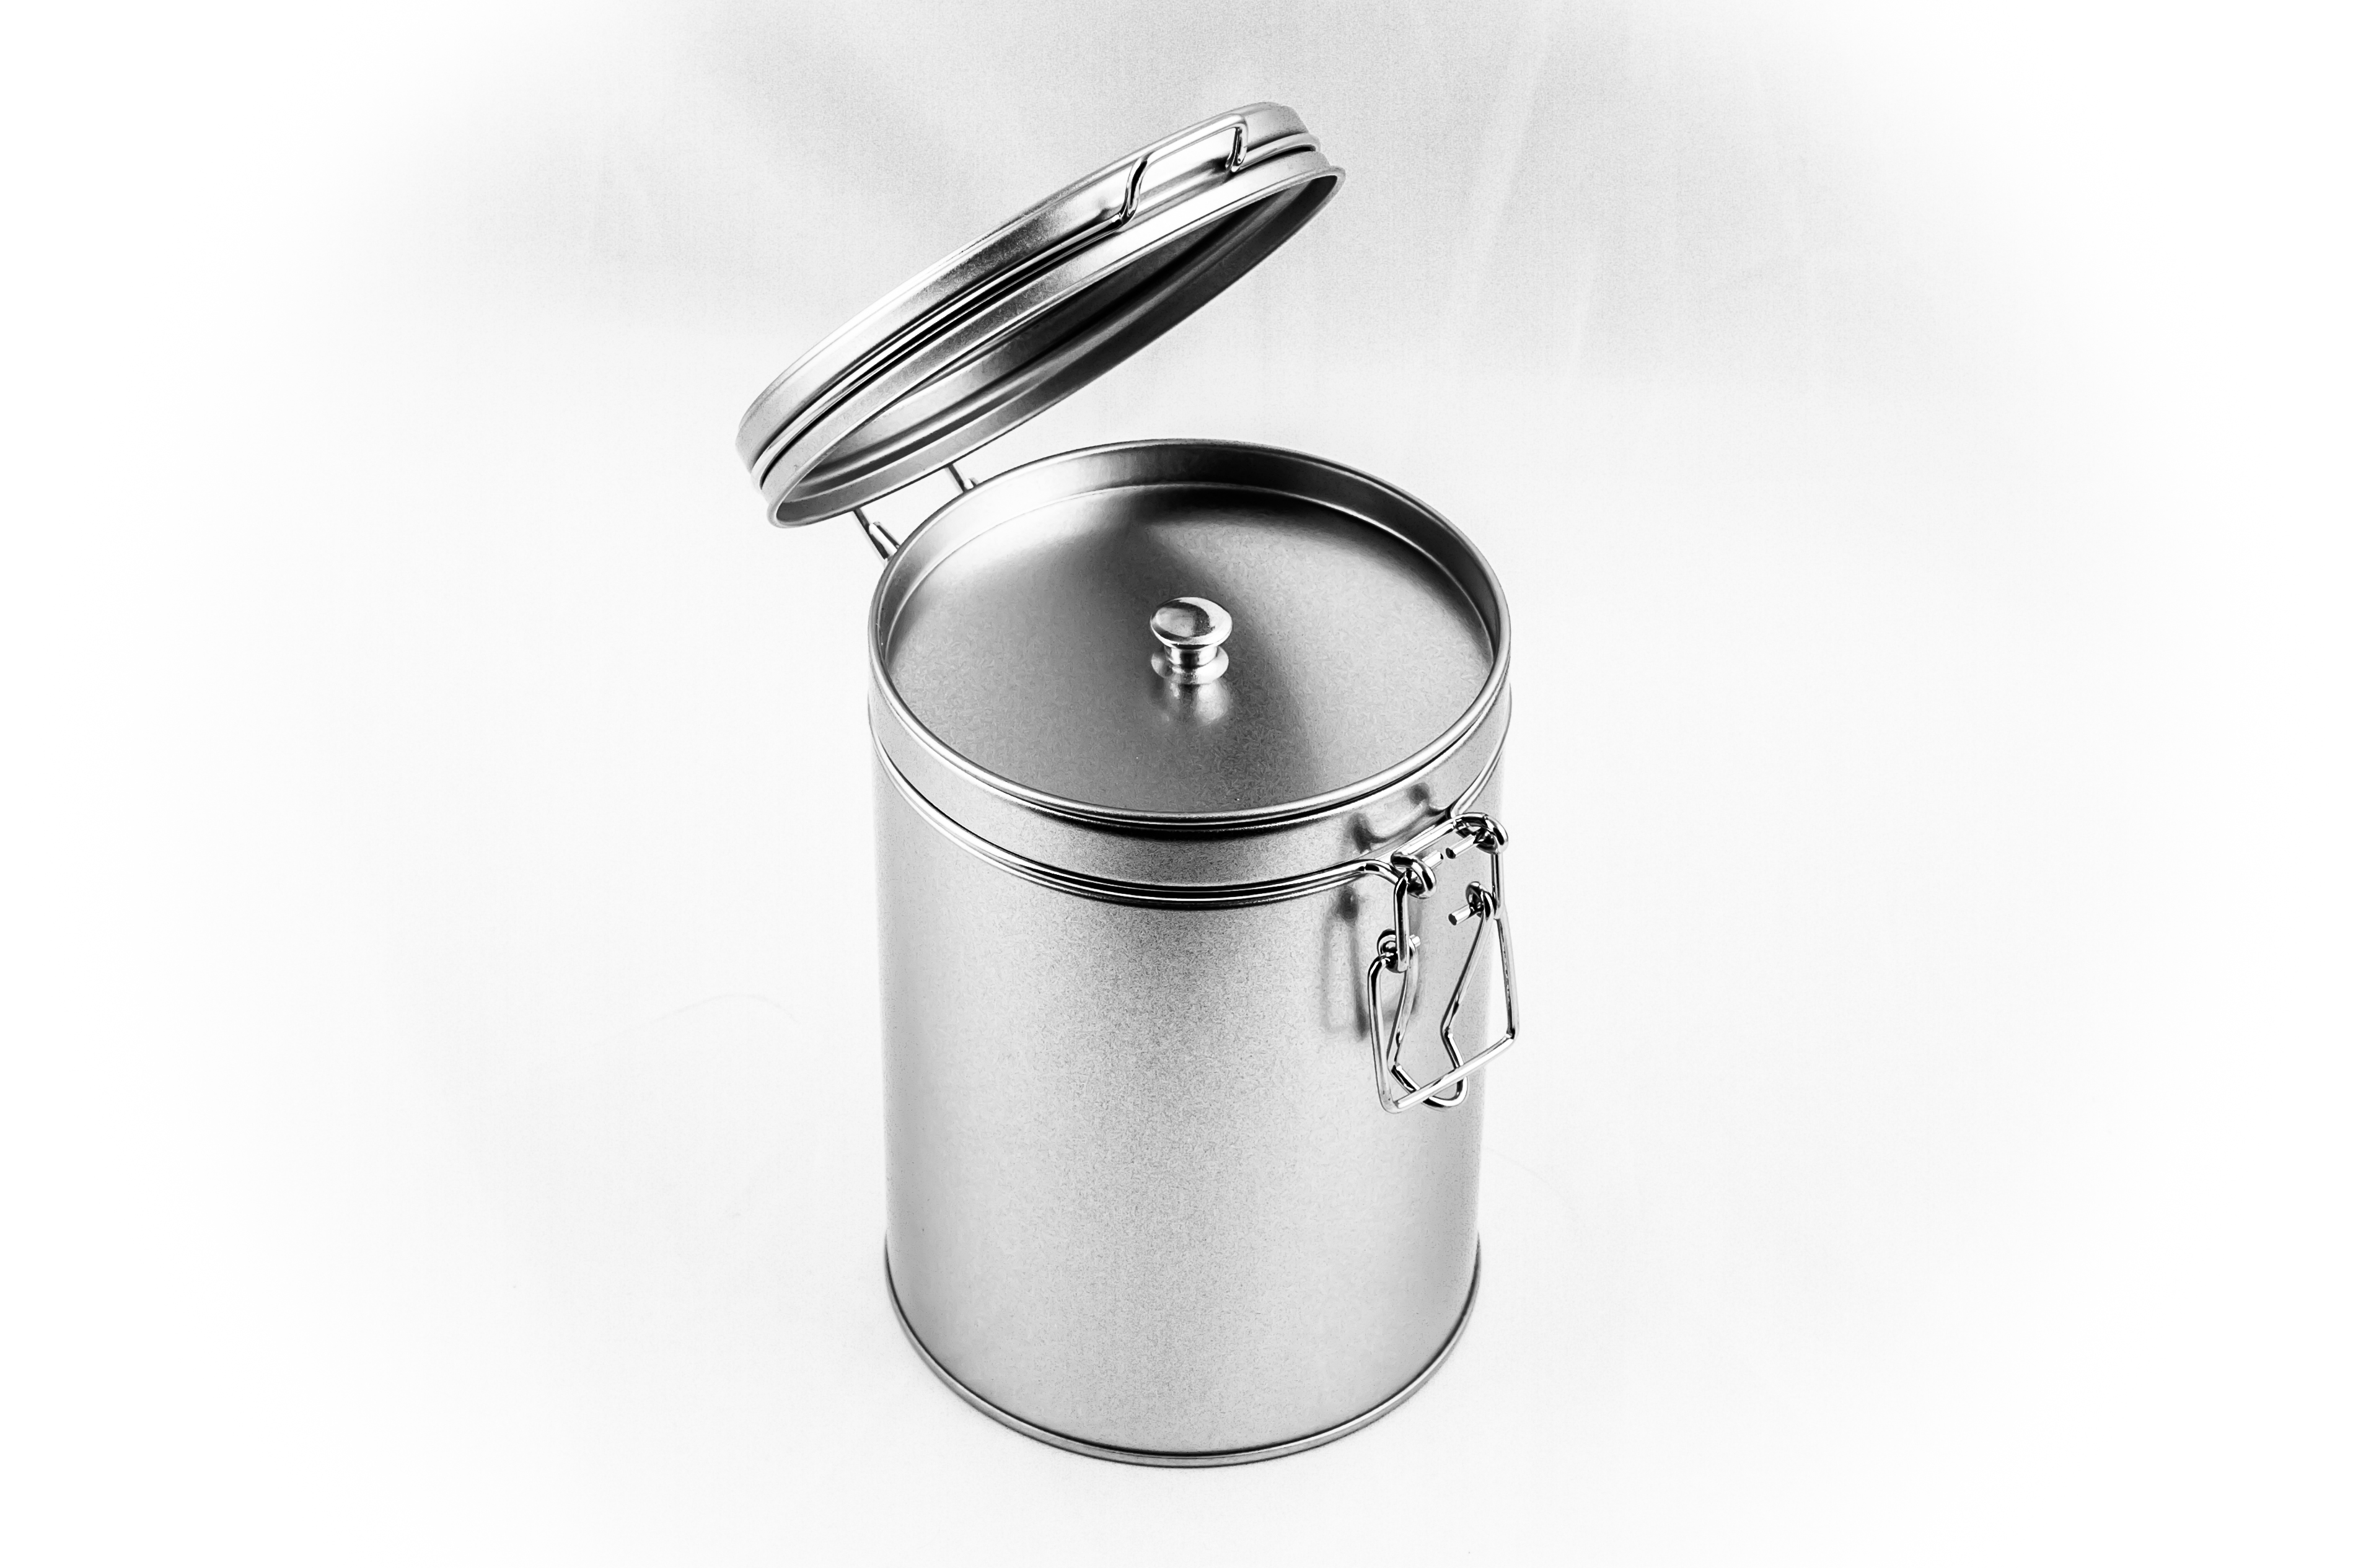 Coffee and tea tinbox